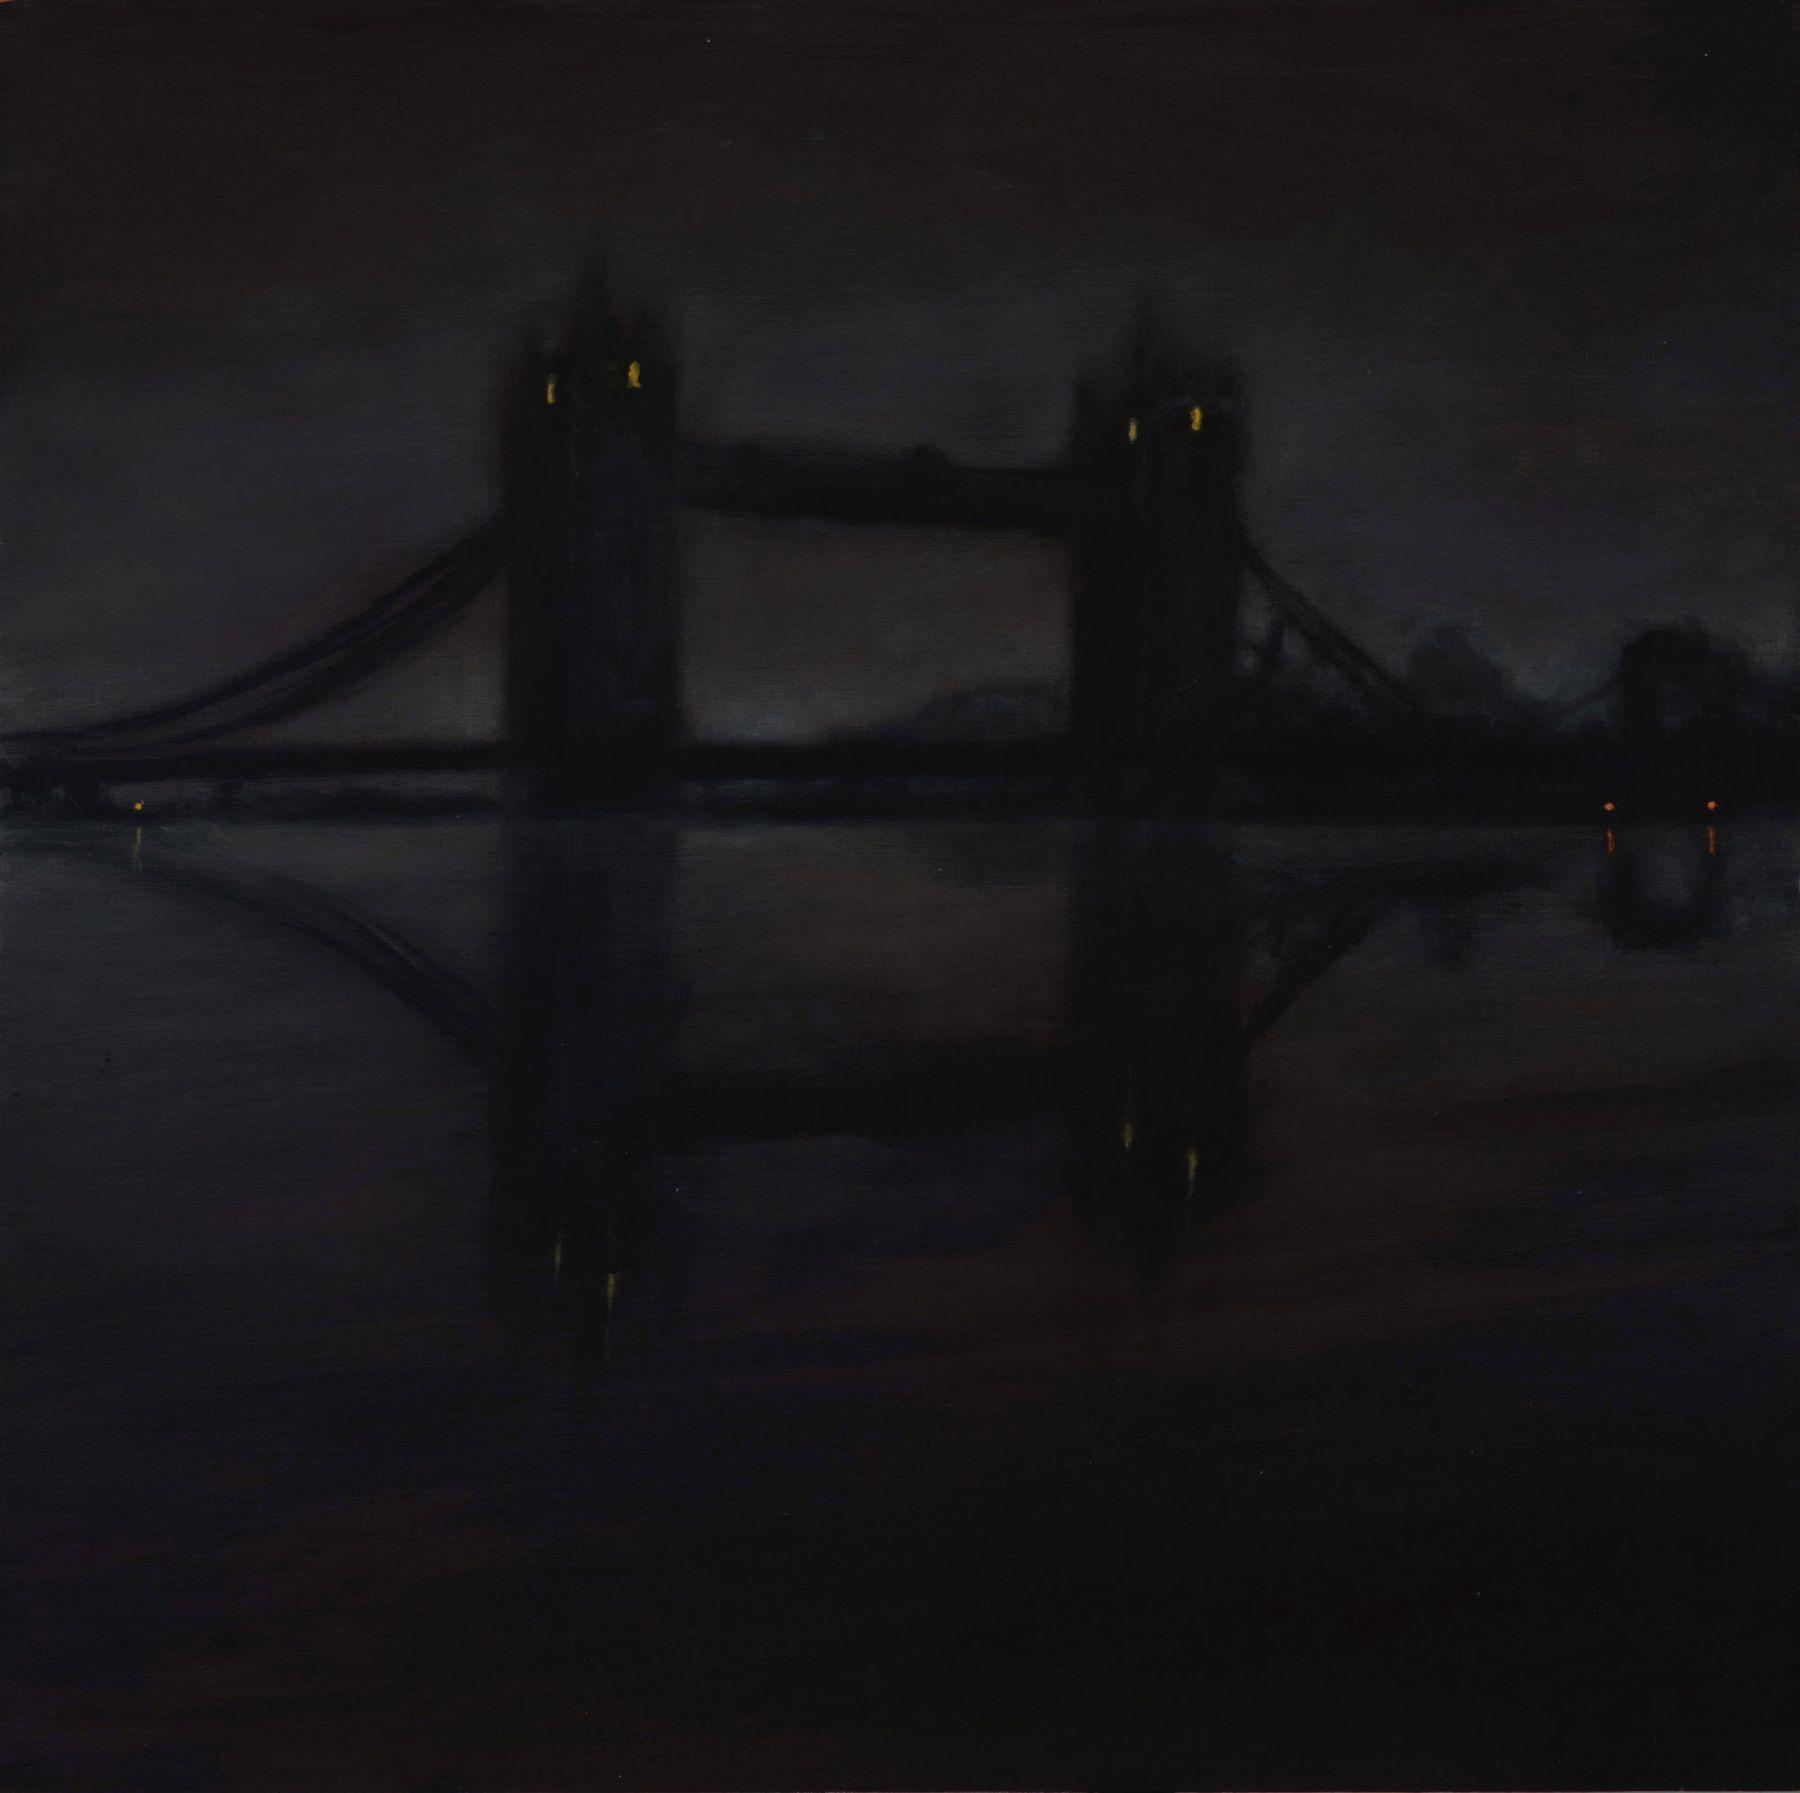 Chris Peters, Whistler Bridge